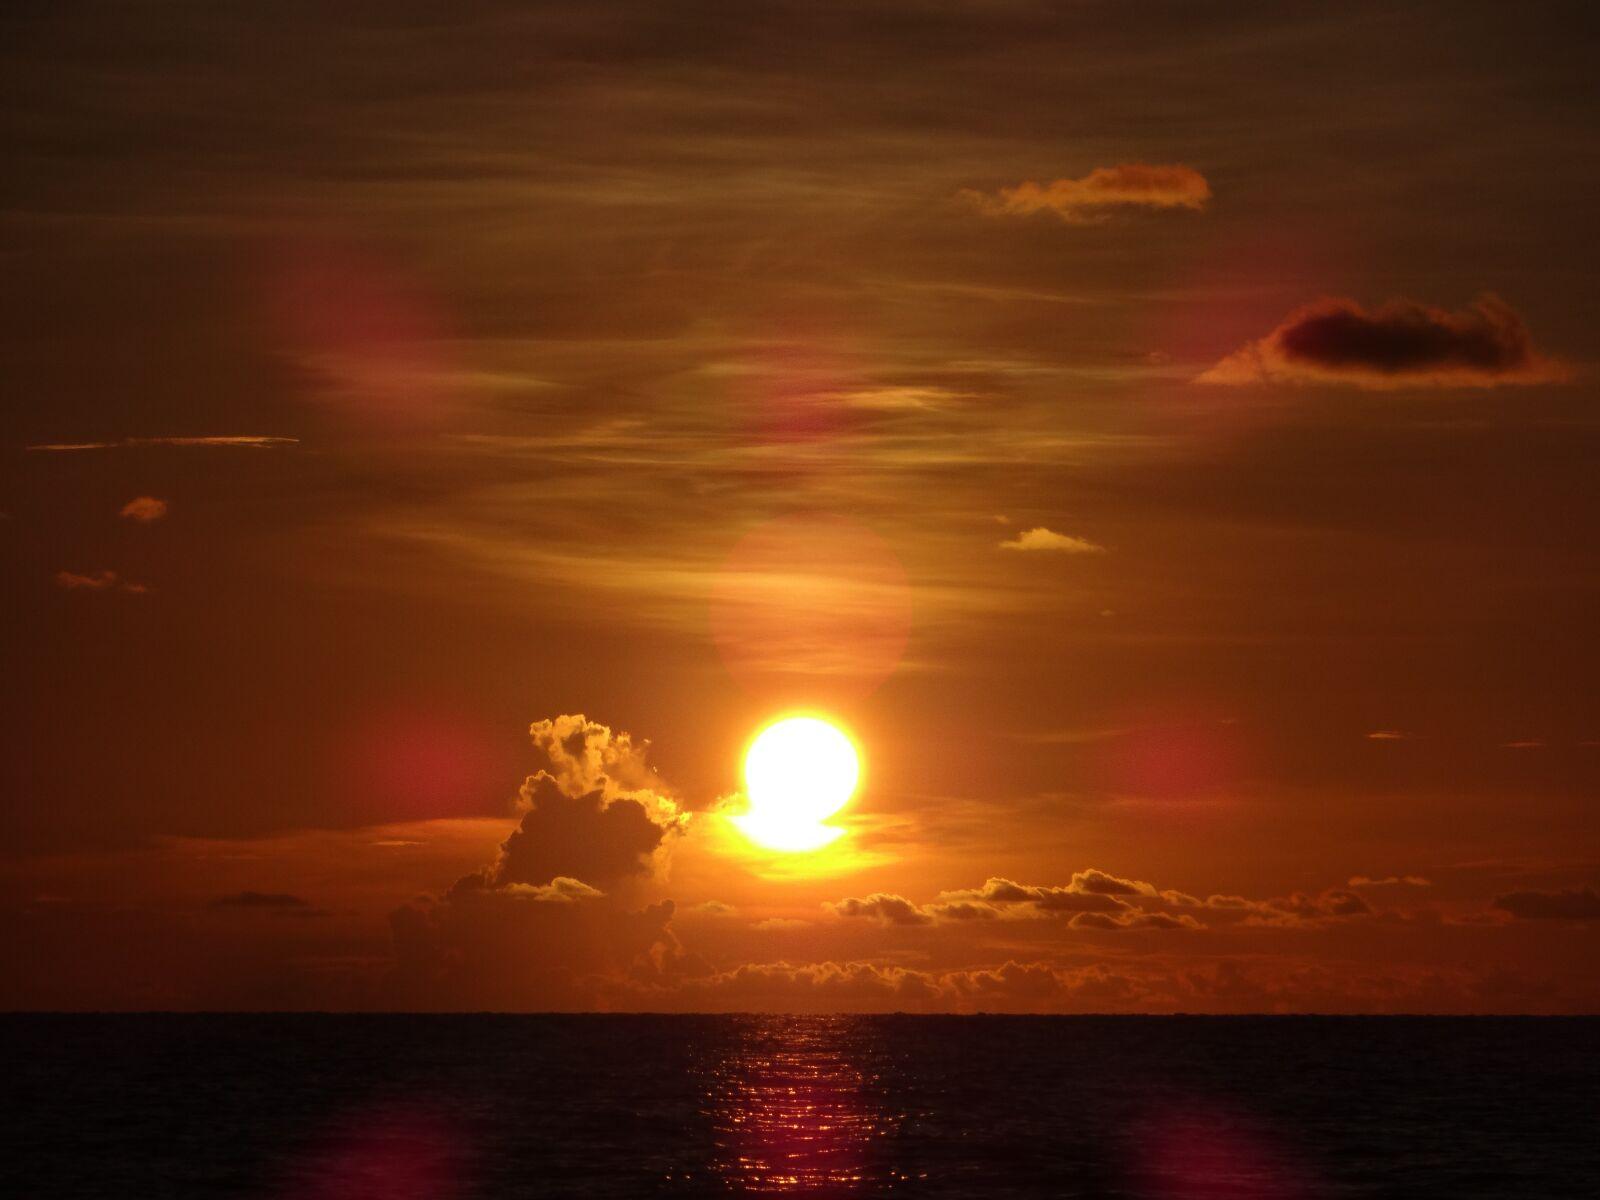 sunset, sun, beach